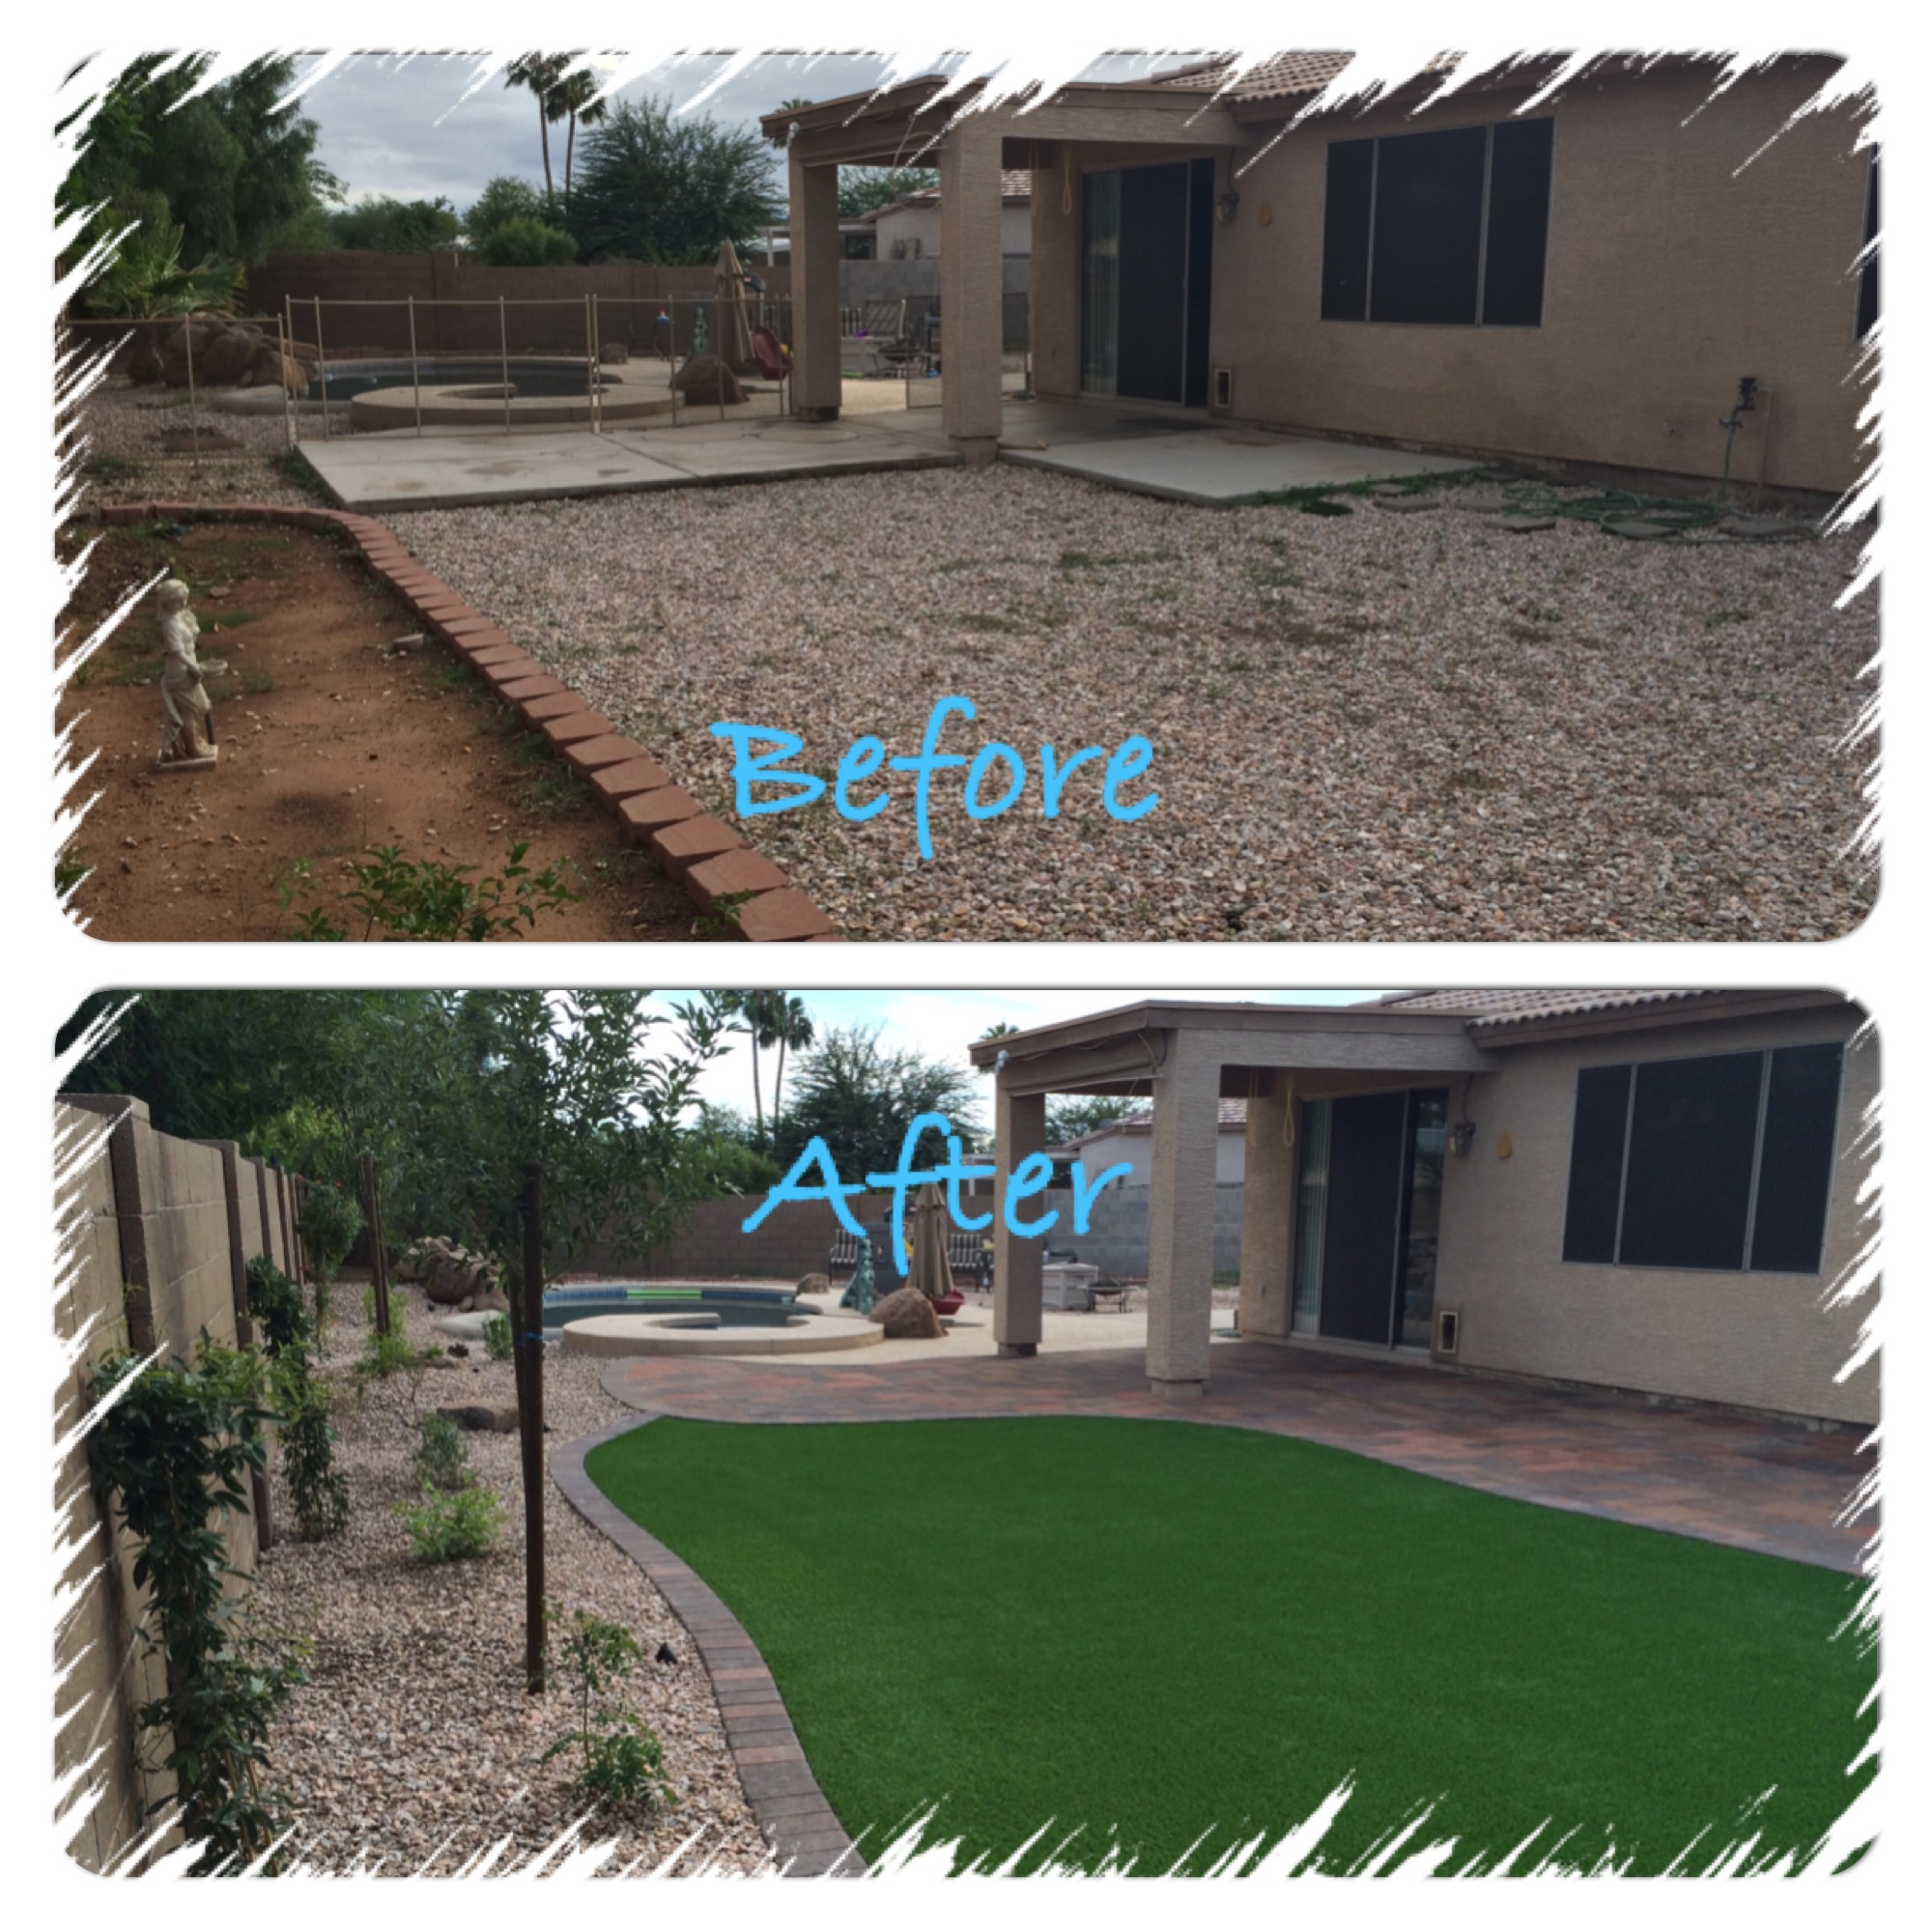 Synthetic Grass Archives - Arizona Living Landscape & Design